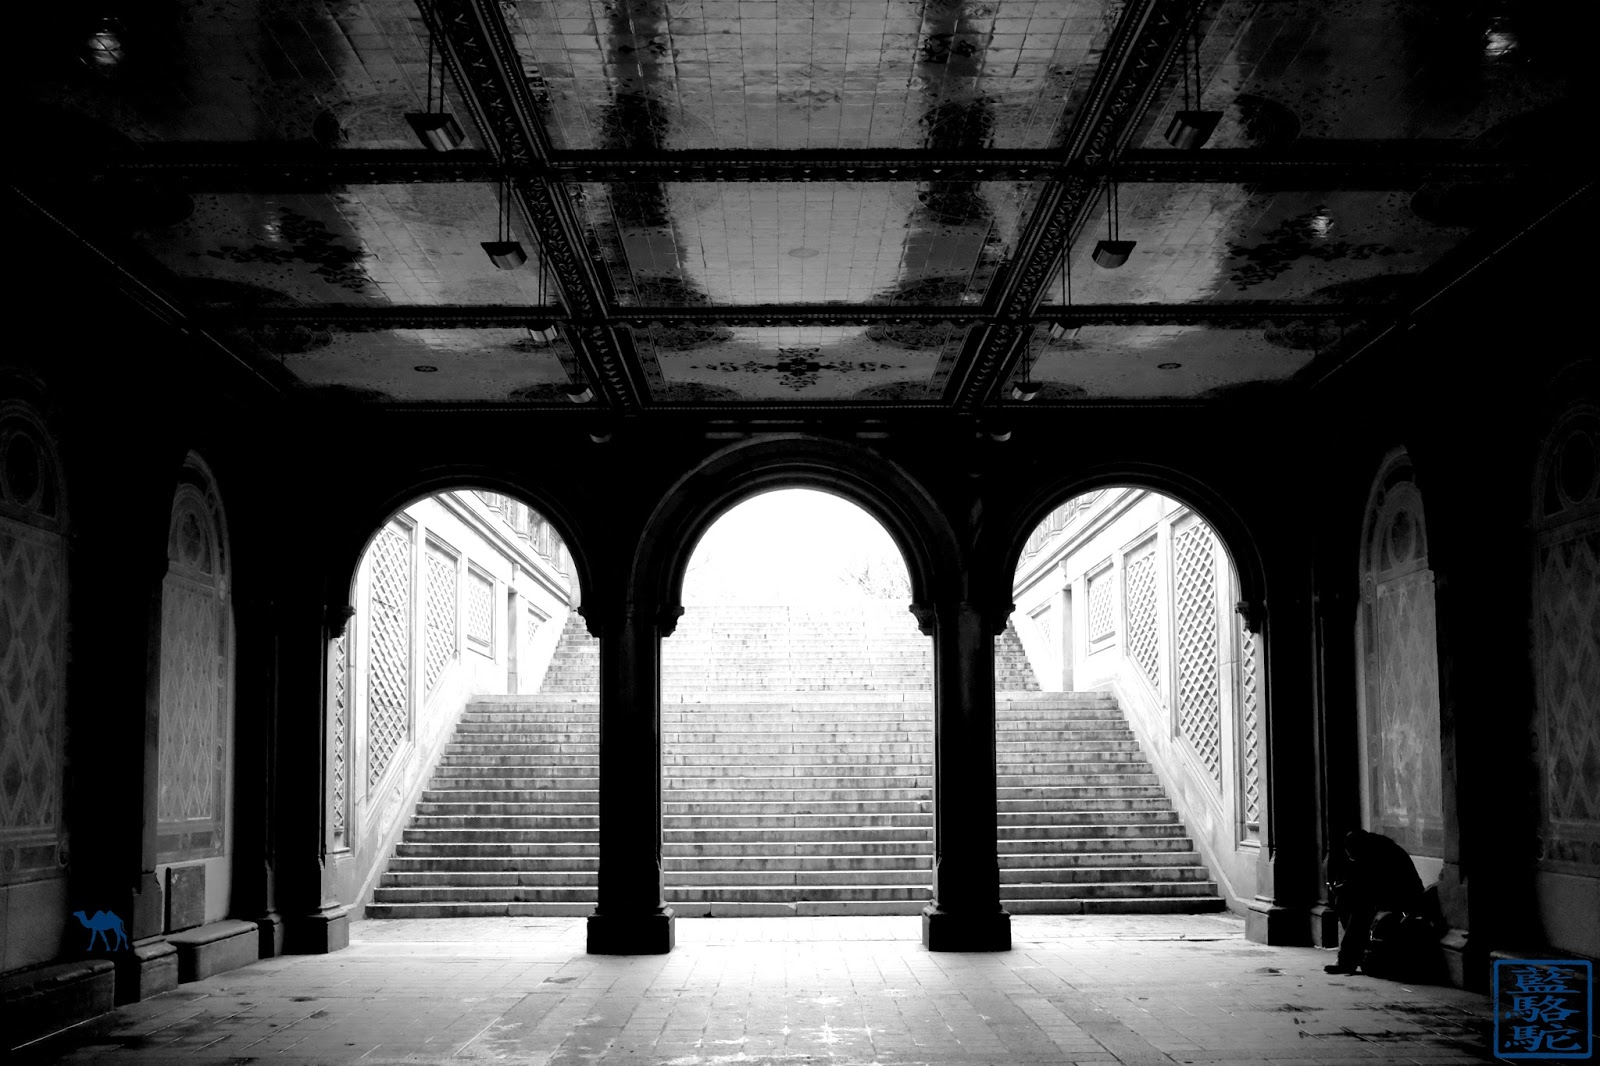 Le Chameau Bleu - Photography New York USA - Central Park USA